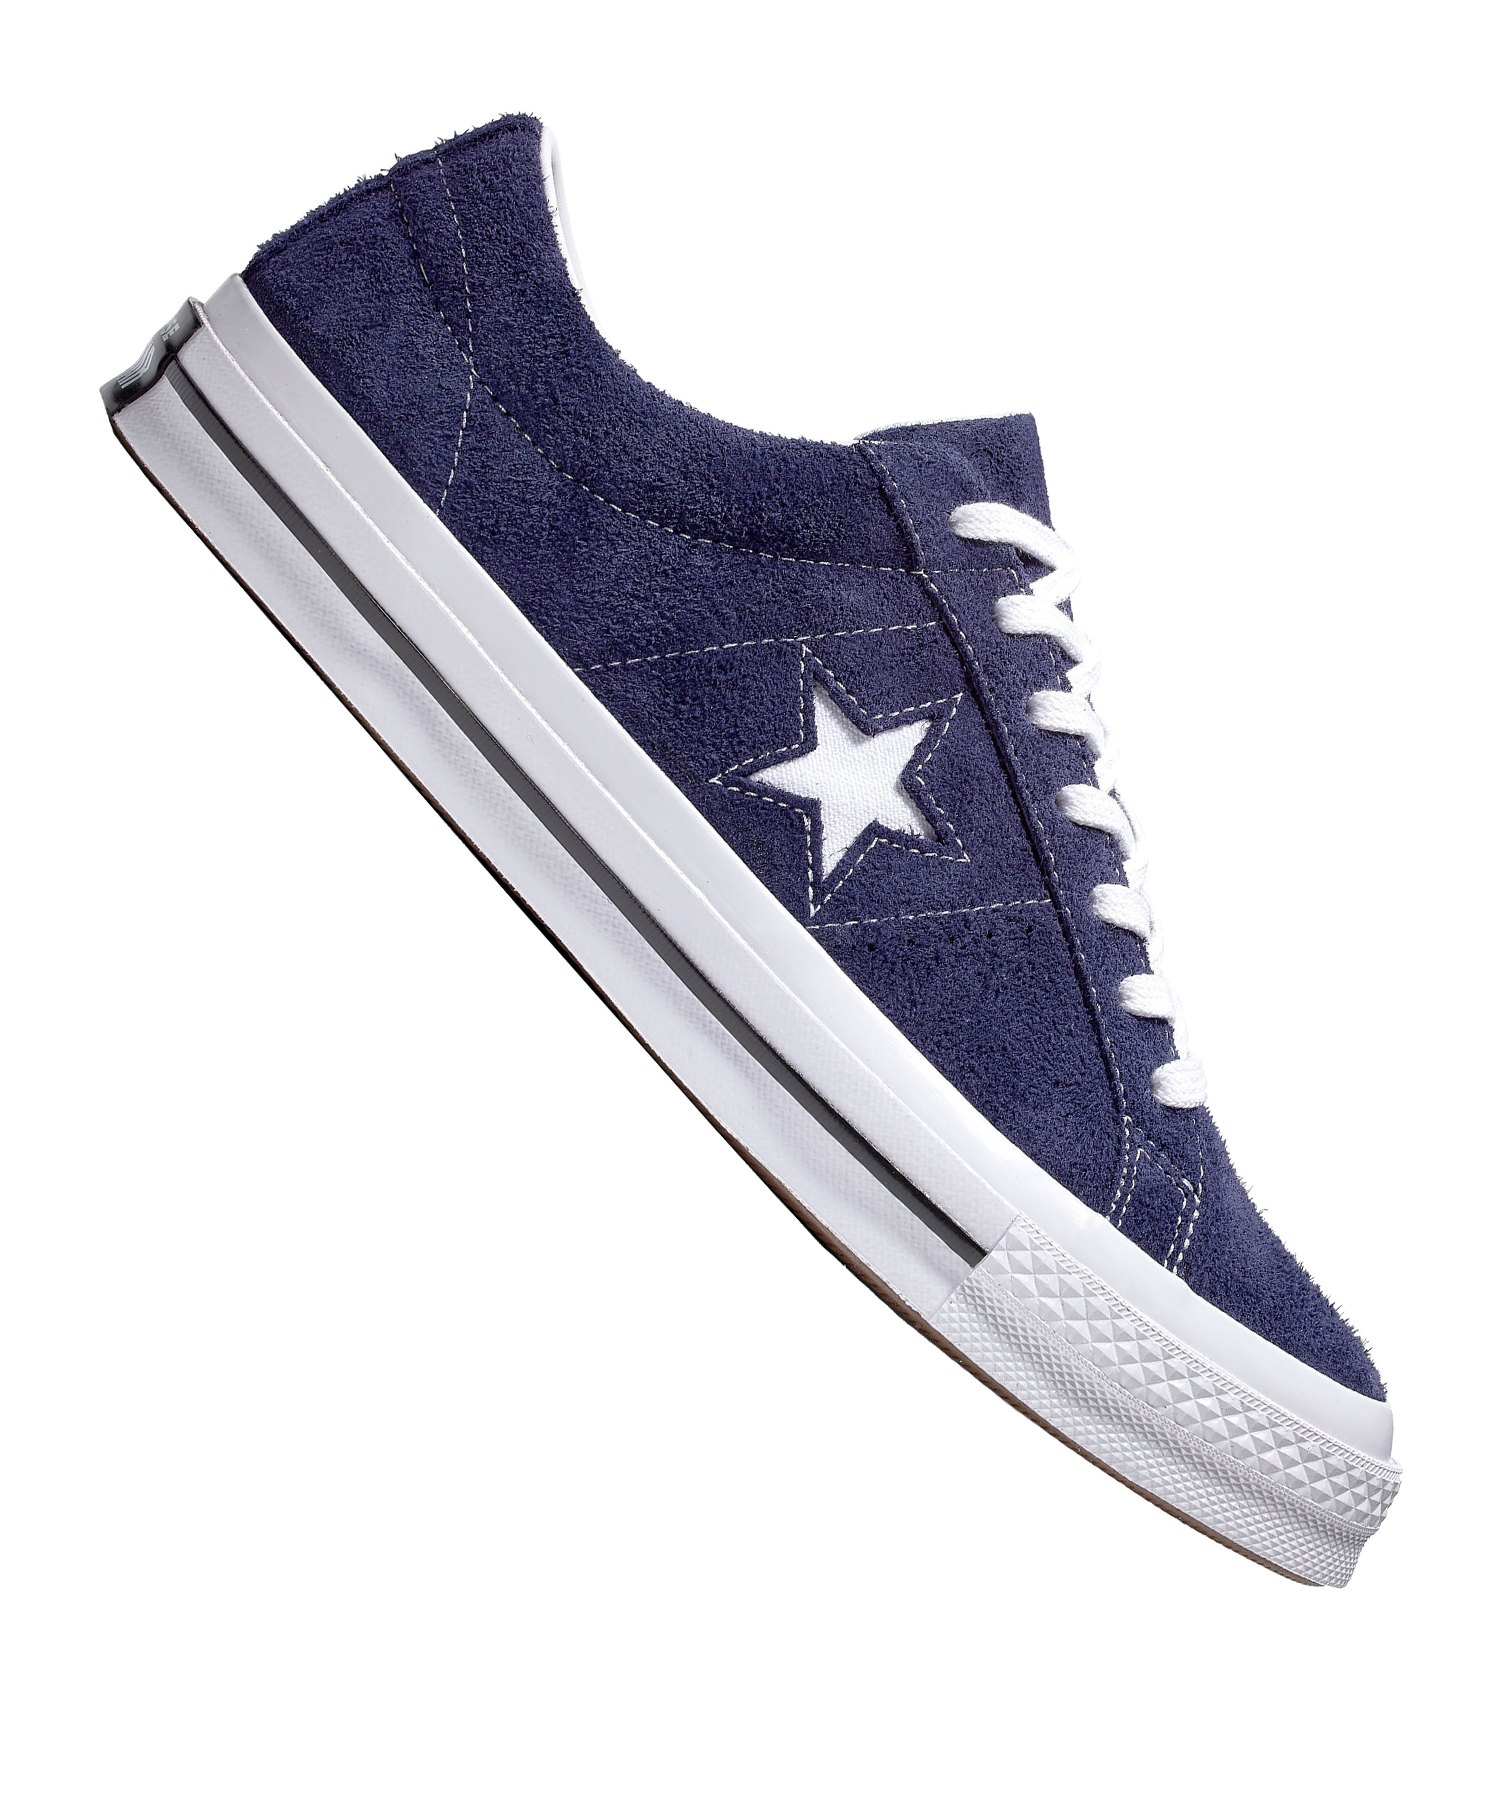 Converse One Star Ox Schuhe lila